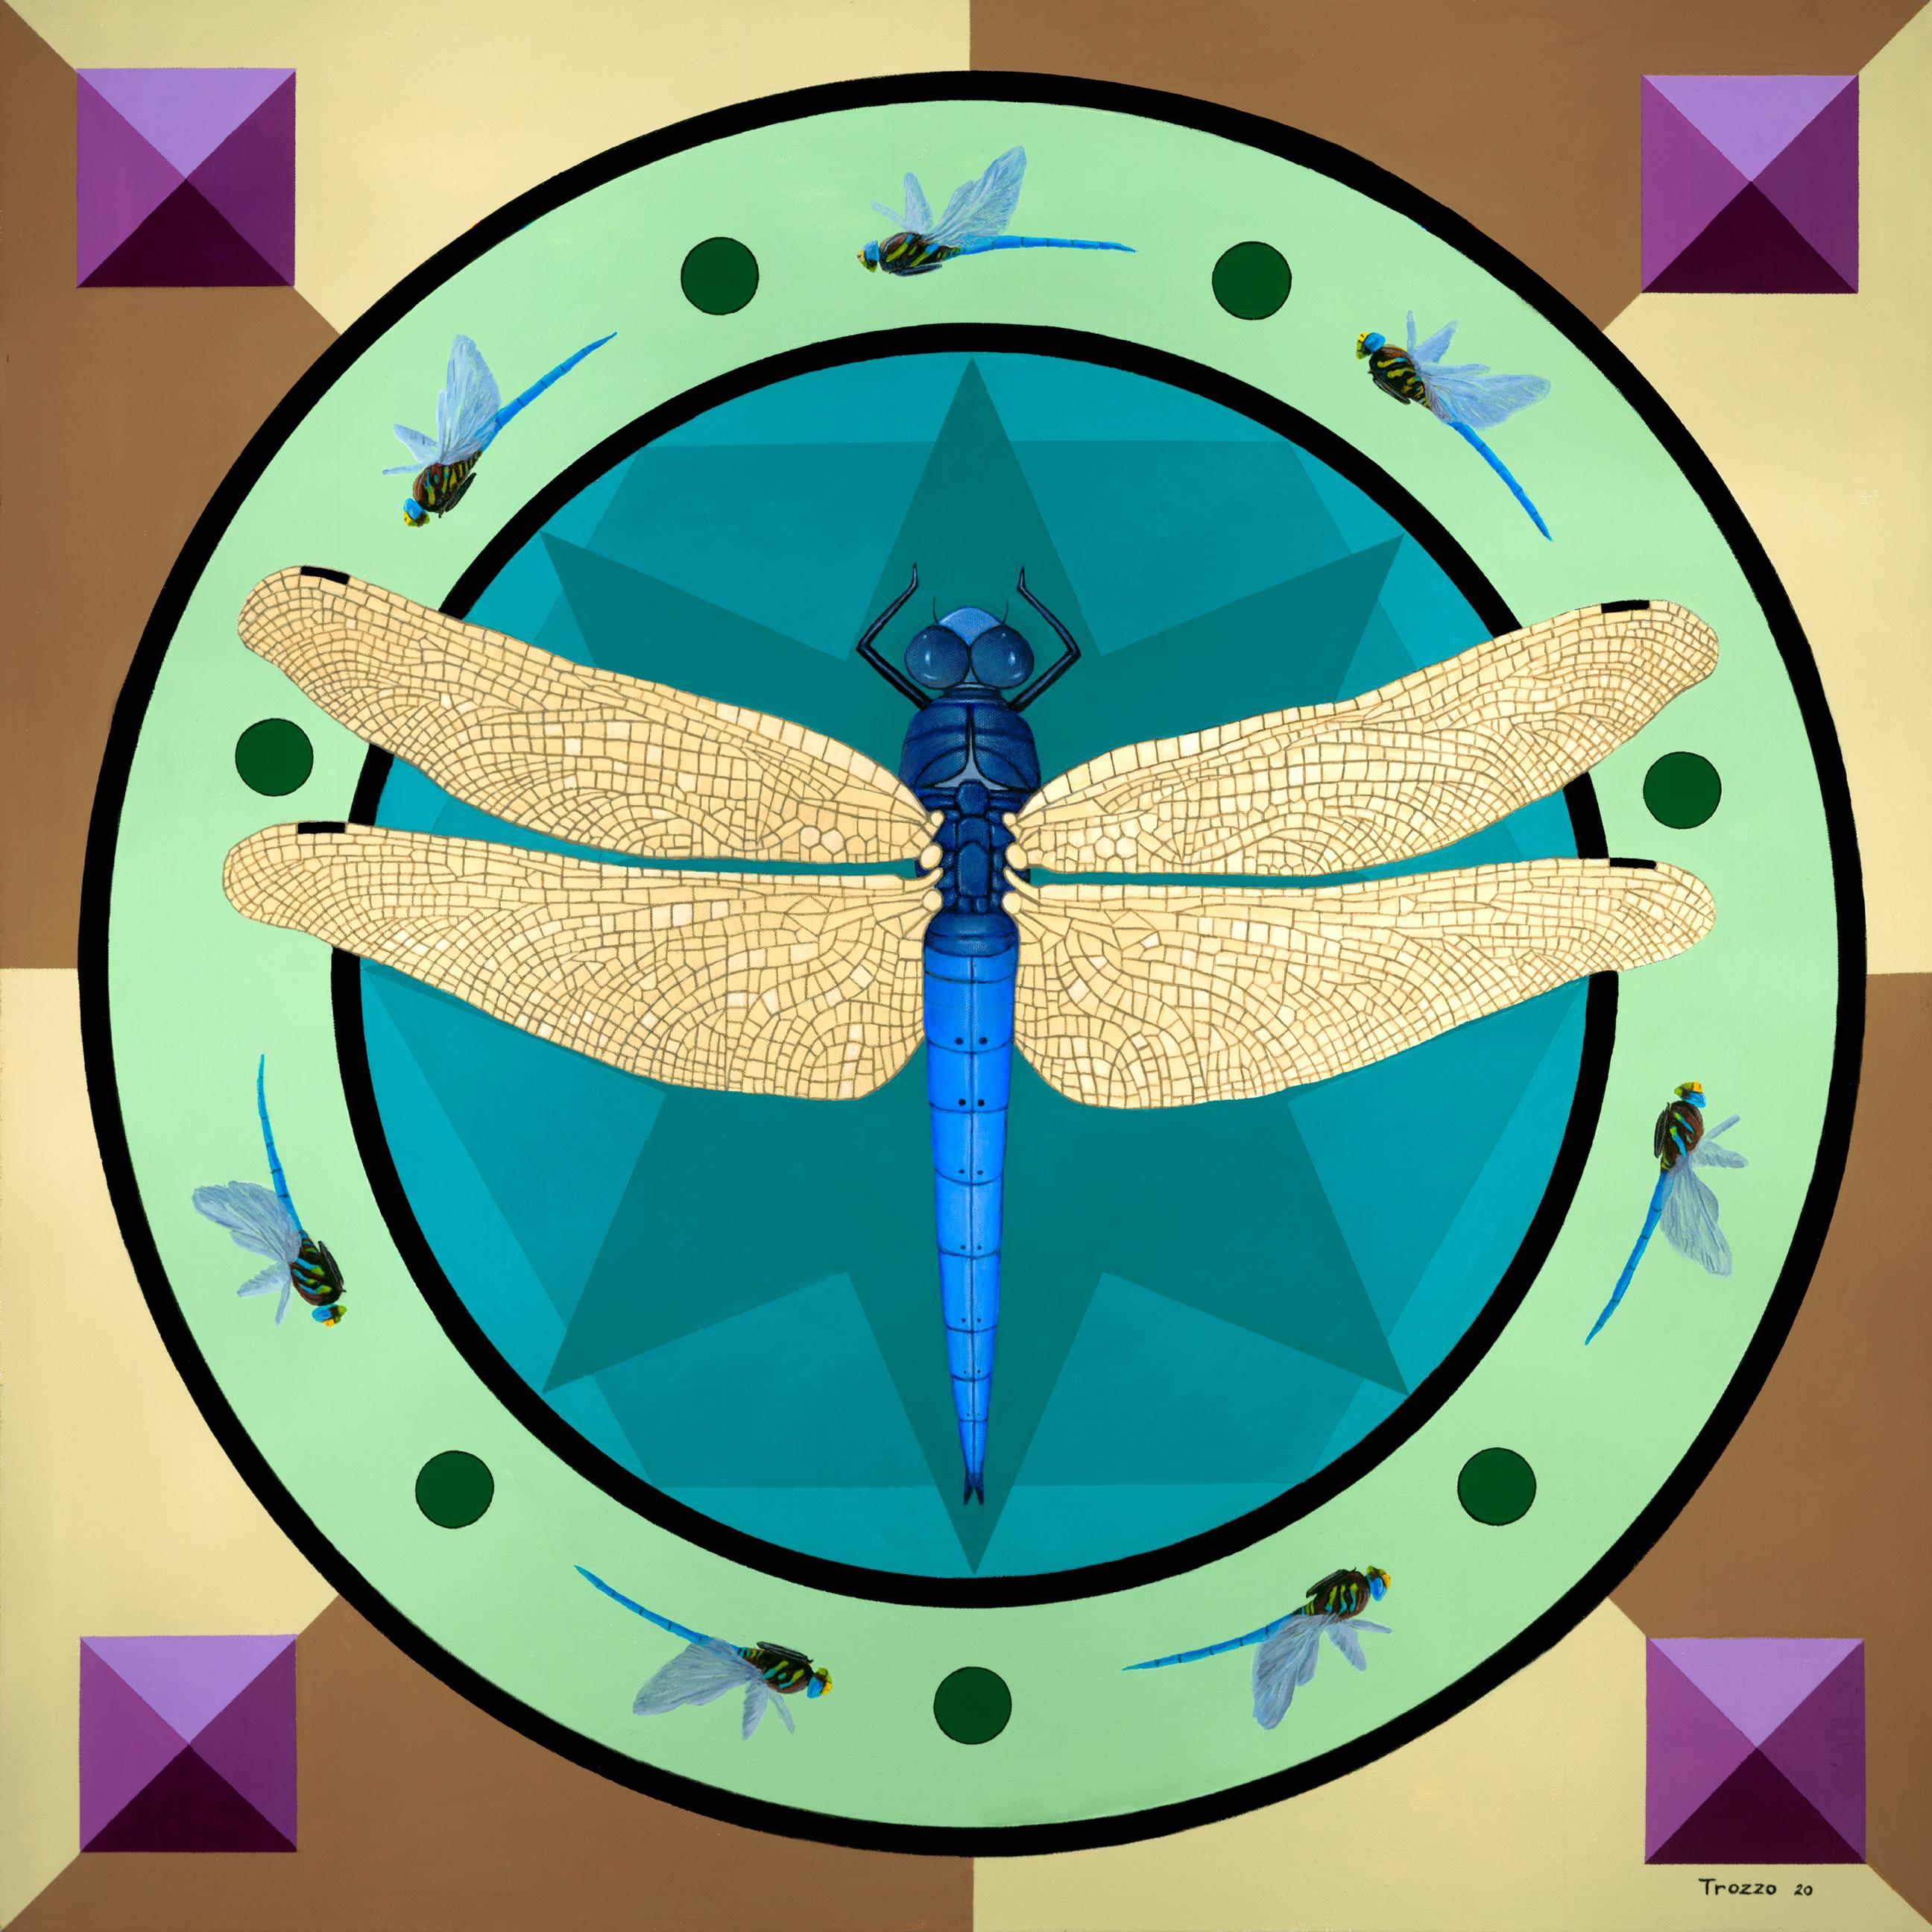 Dragonfly mandala asf 4 72 ymkxvz